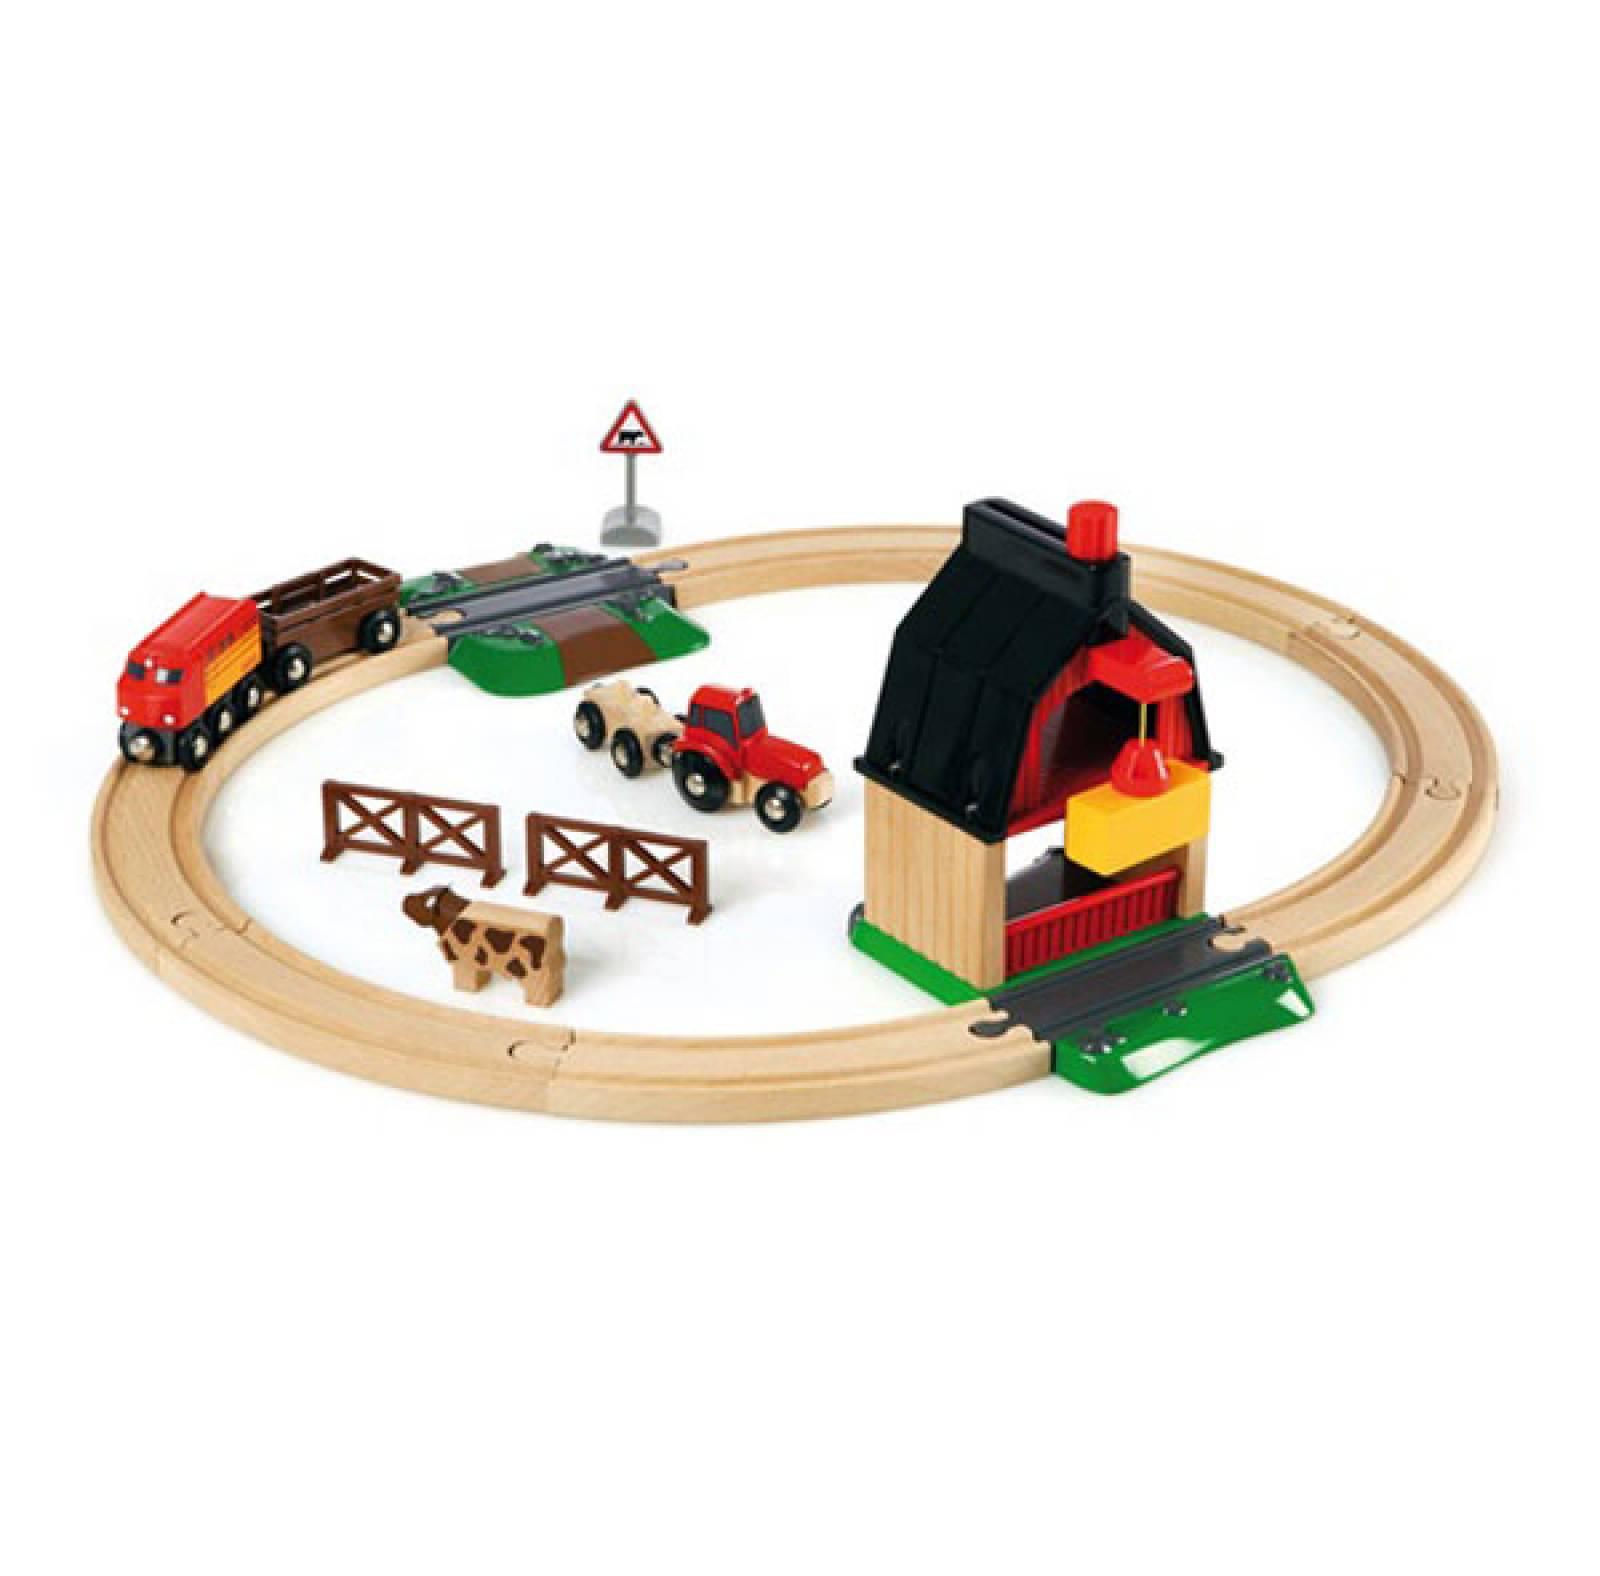 Farm Railway Set BRIO Wooden Railway 3+ thumbnails